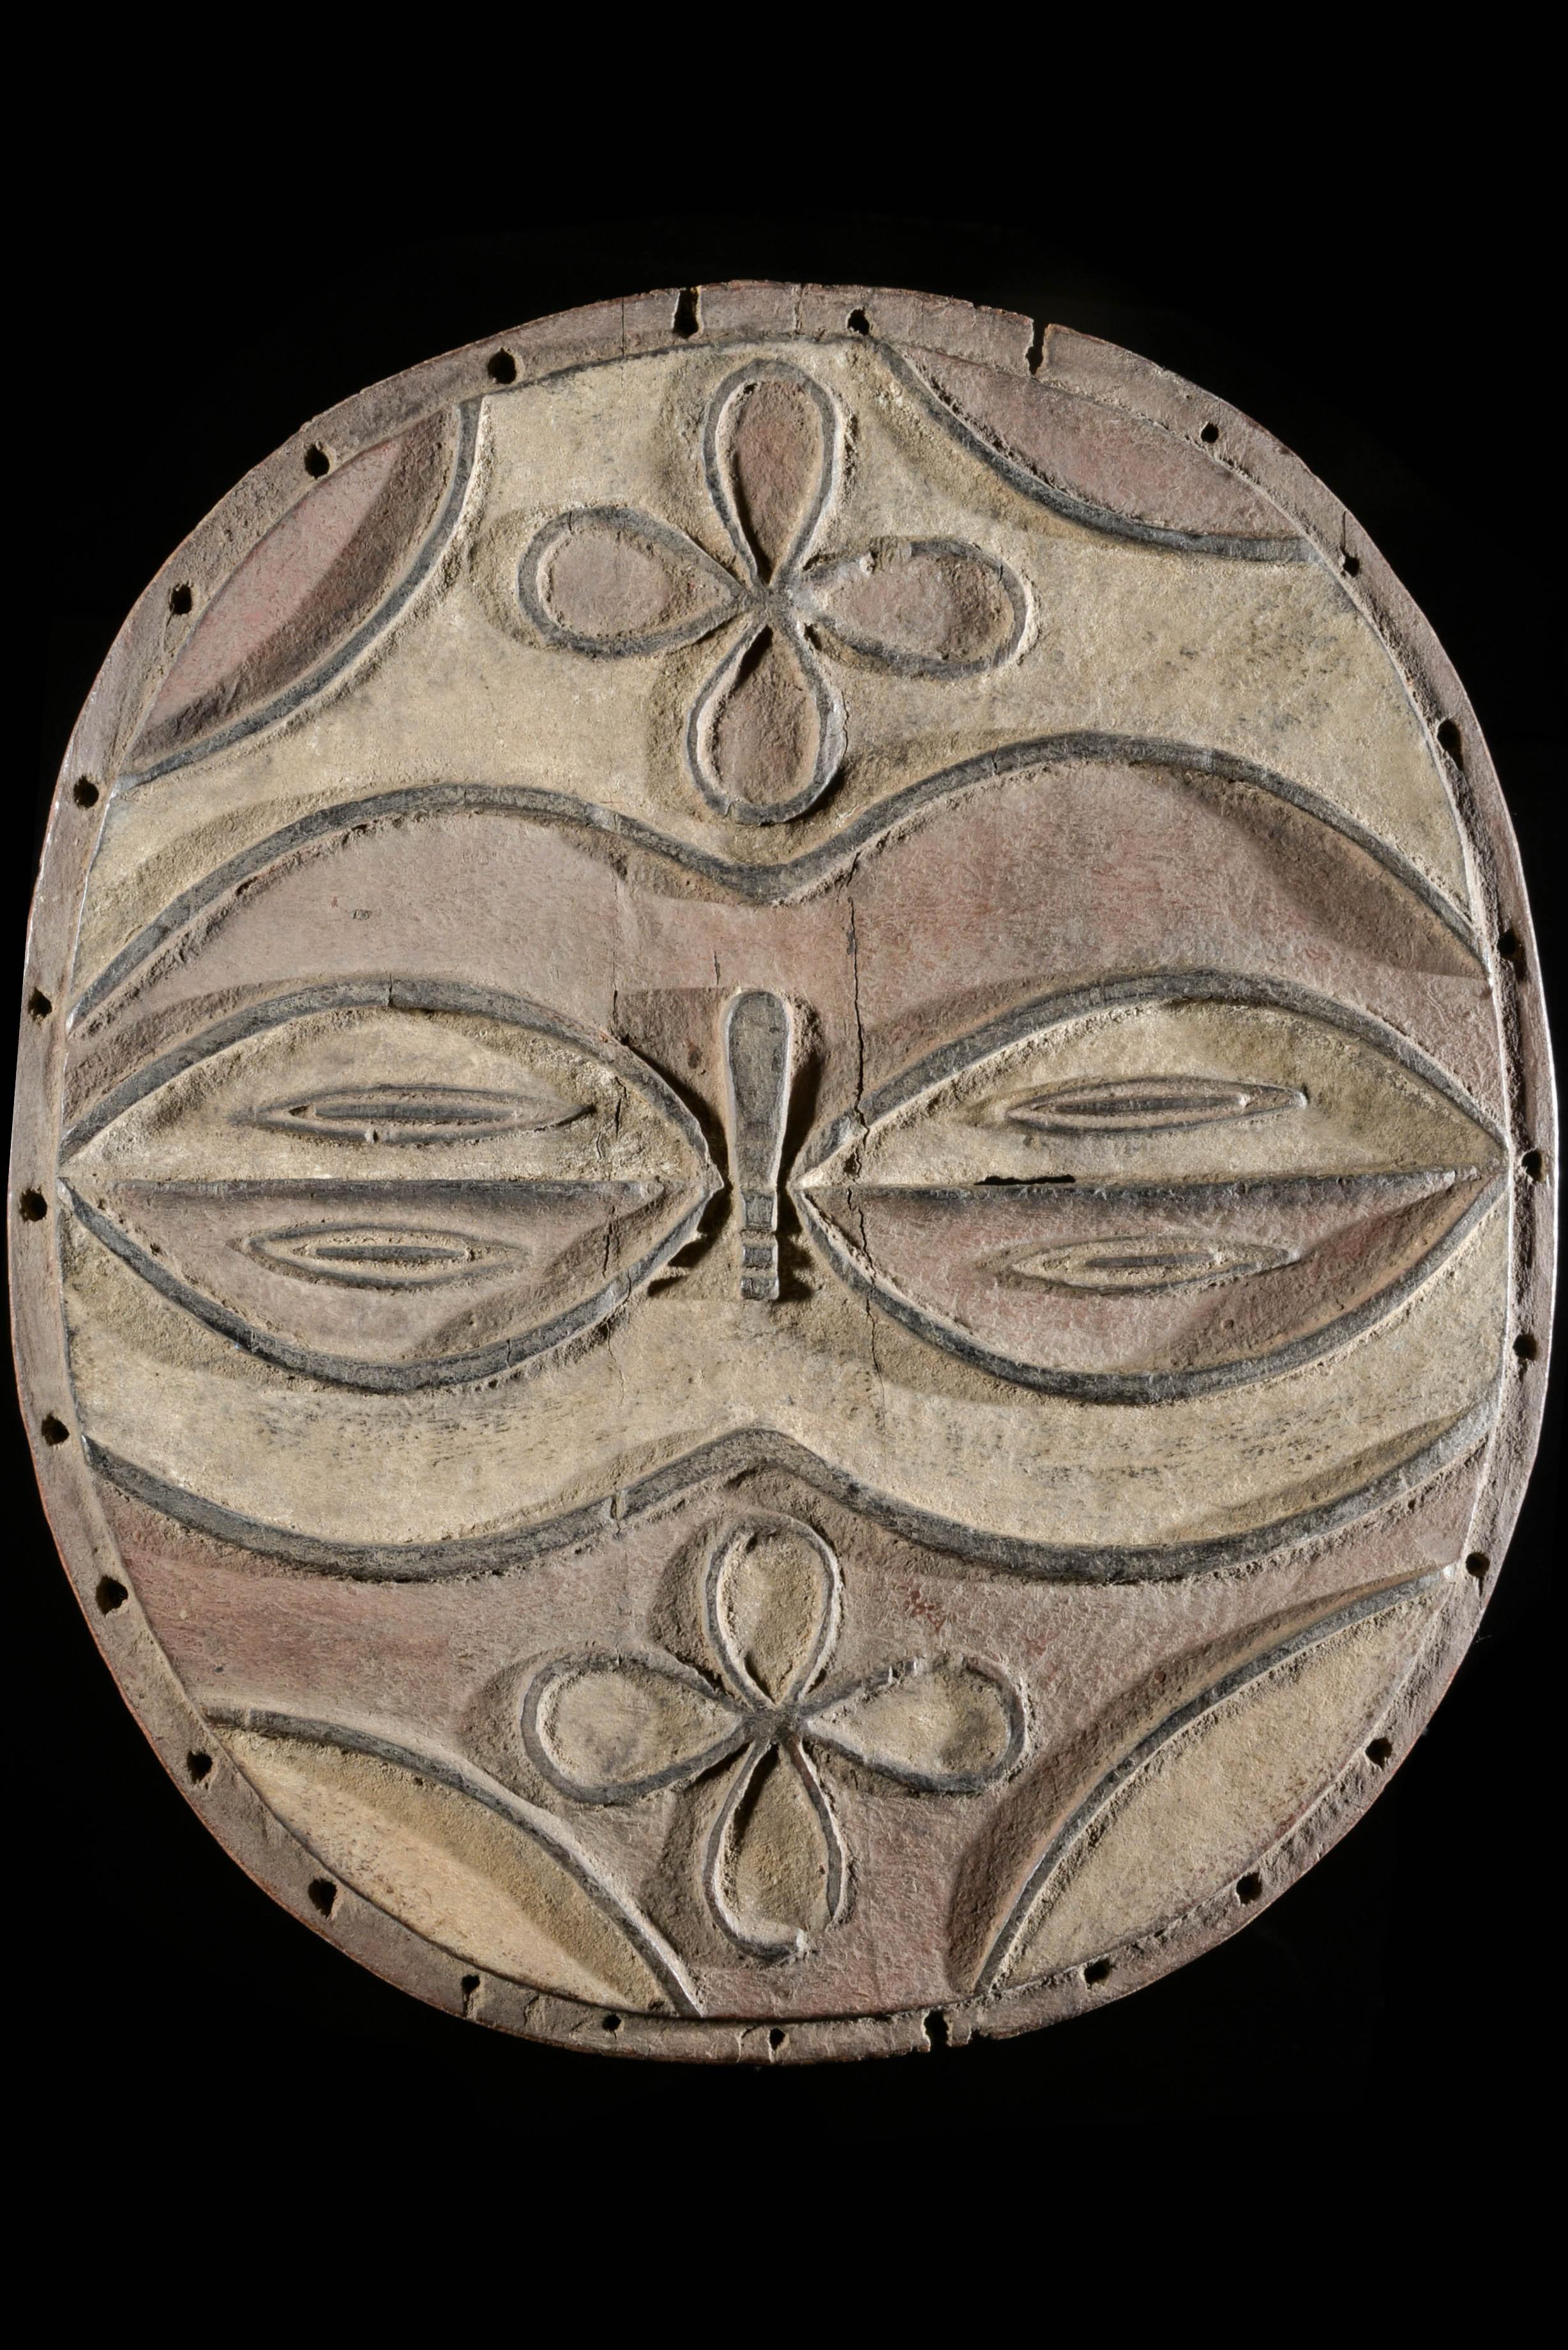 Masque facial - Teke / Tsayi - RDC Zaire